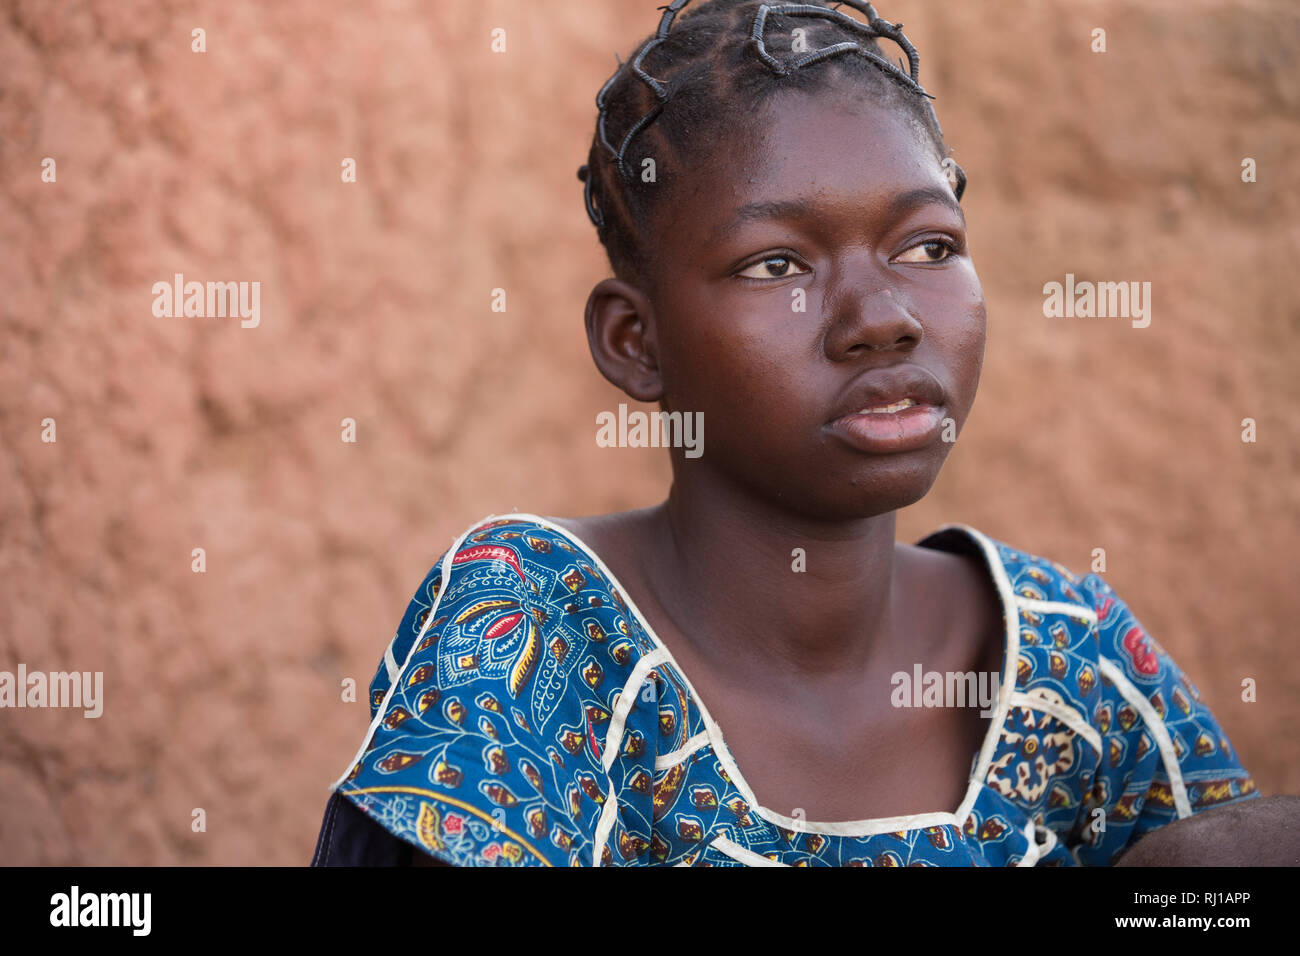 Samba village, Yako Province, Burkina Faso: Abzetta Sondo, 19,. Her child is suffering from acute malnutrition. Stock Photo